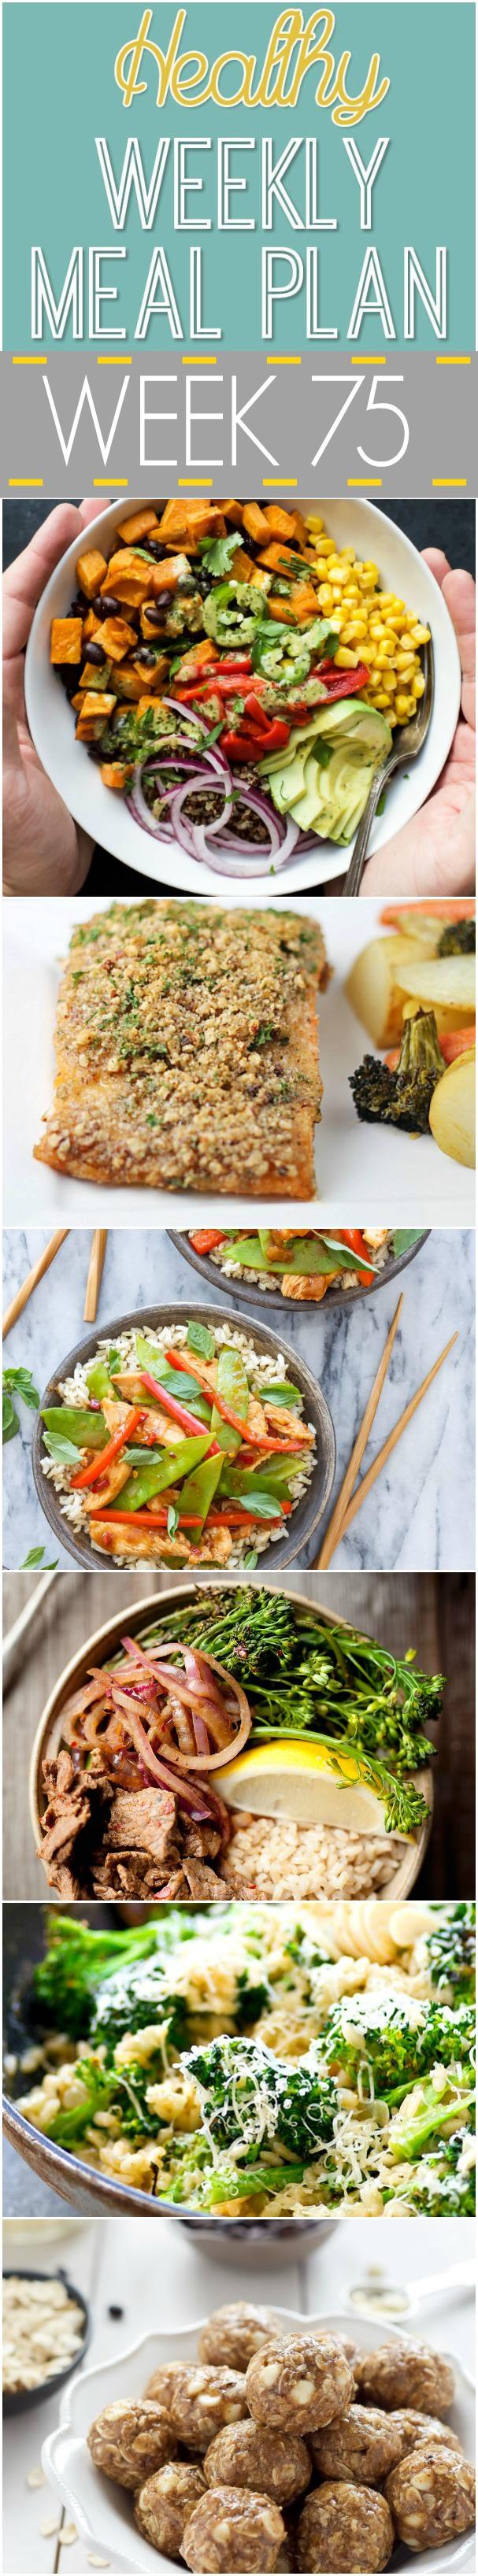 A week full of Sweet Potato Black Bean Quinoa Bowls, Vanilla Espresso Energy Bites and Garlic Broccoli Parmesan Risotto!